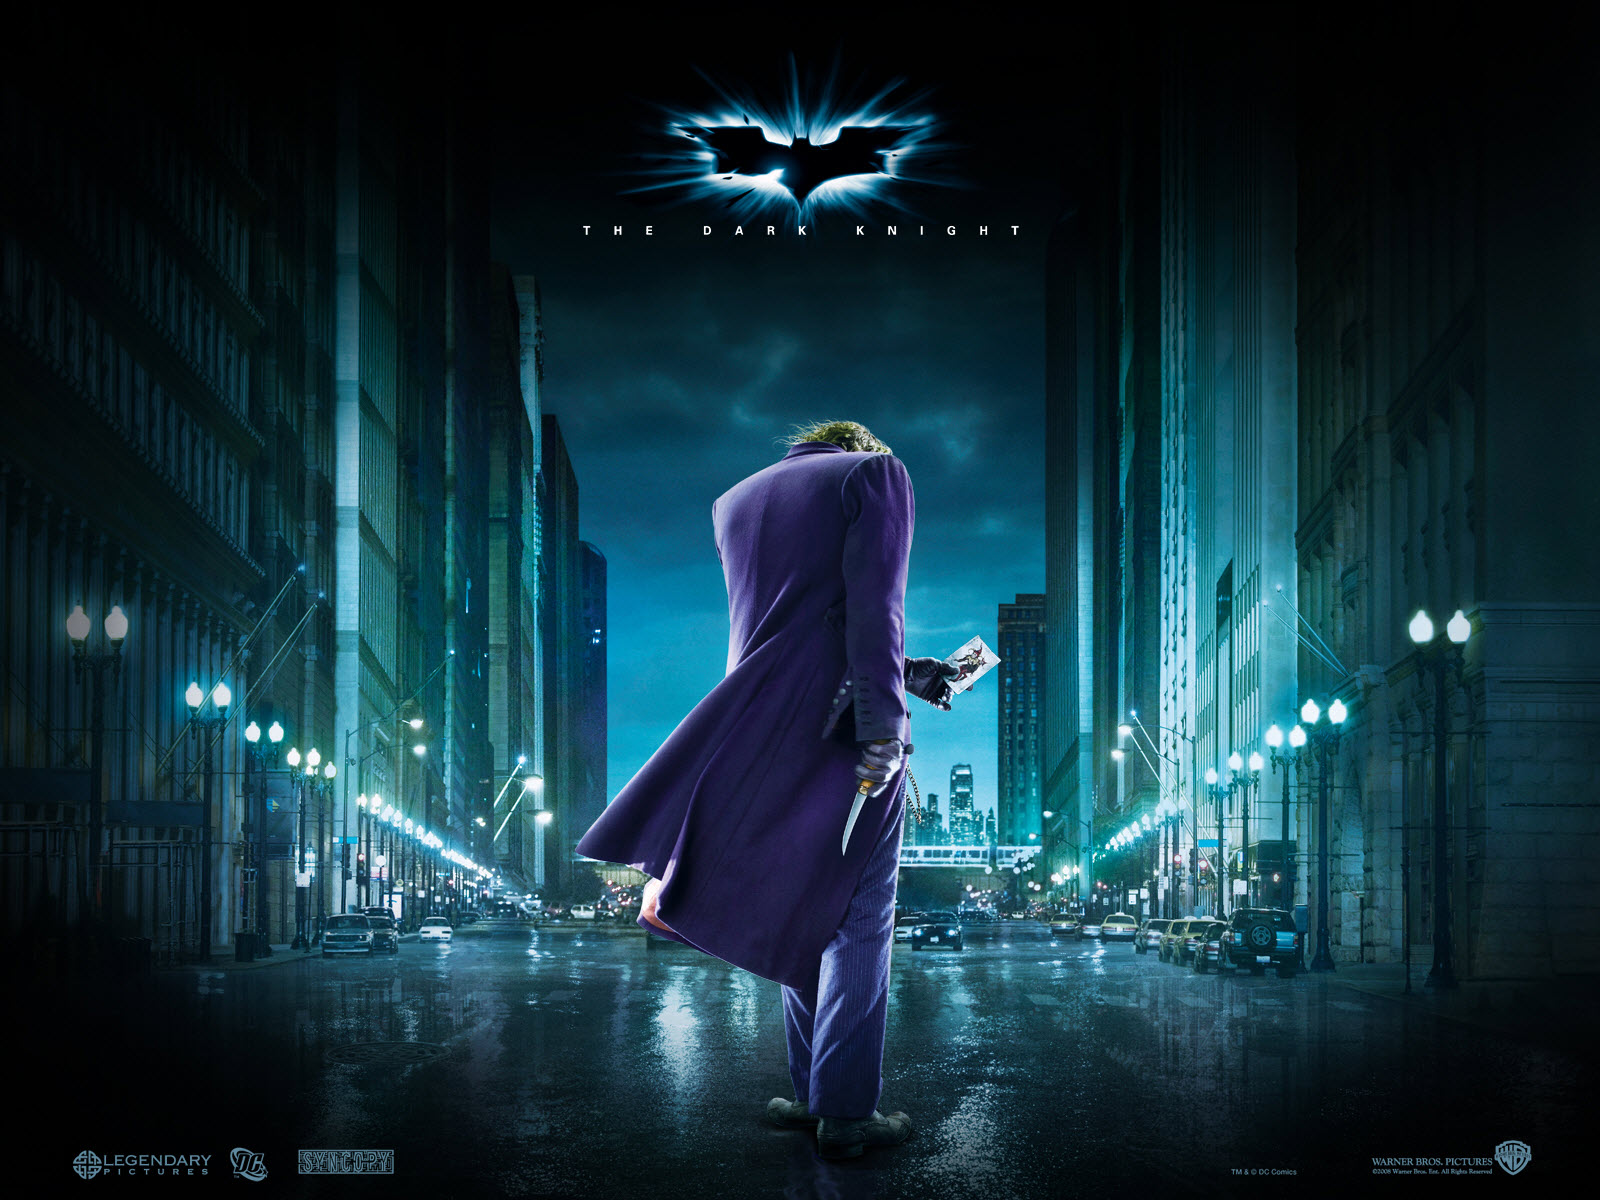 Joker in The Dark Knight Wallpapers HD Wallpapers 1600x1200